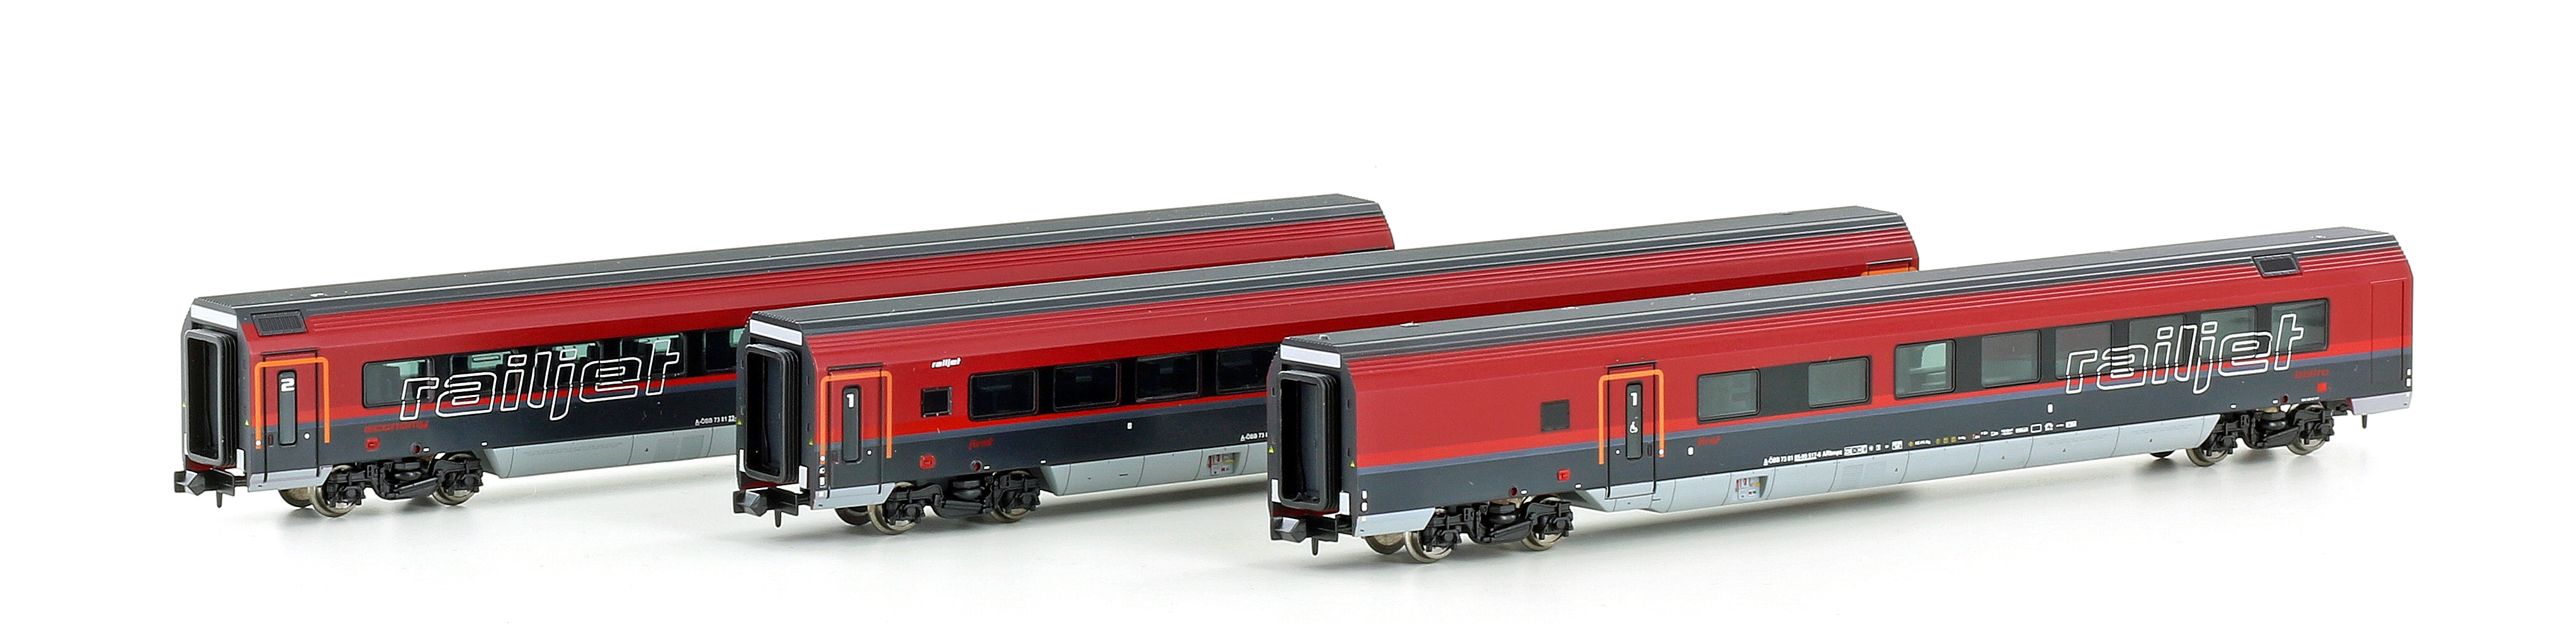 H25221